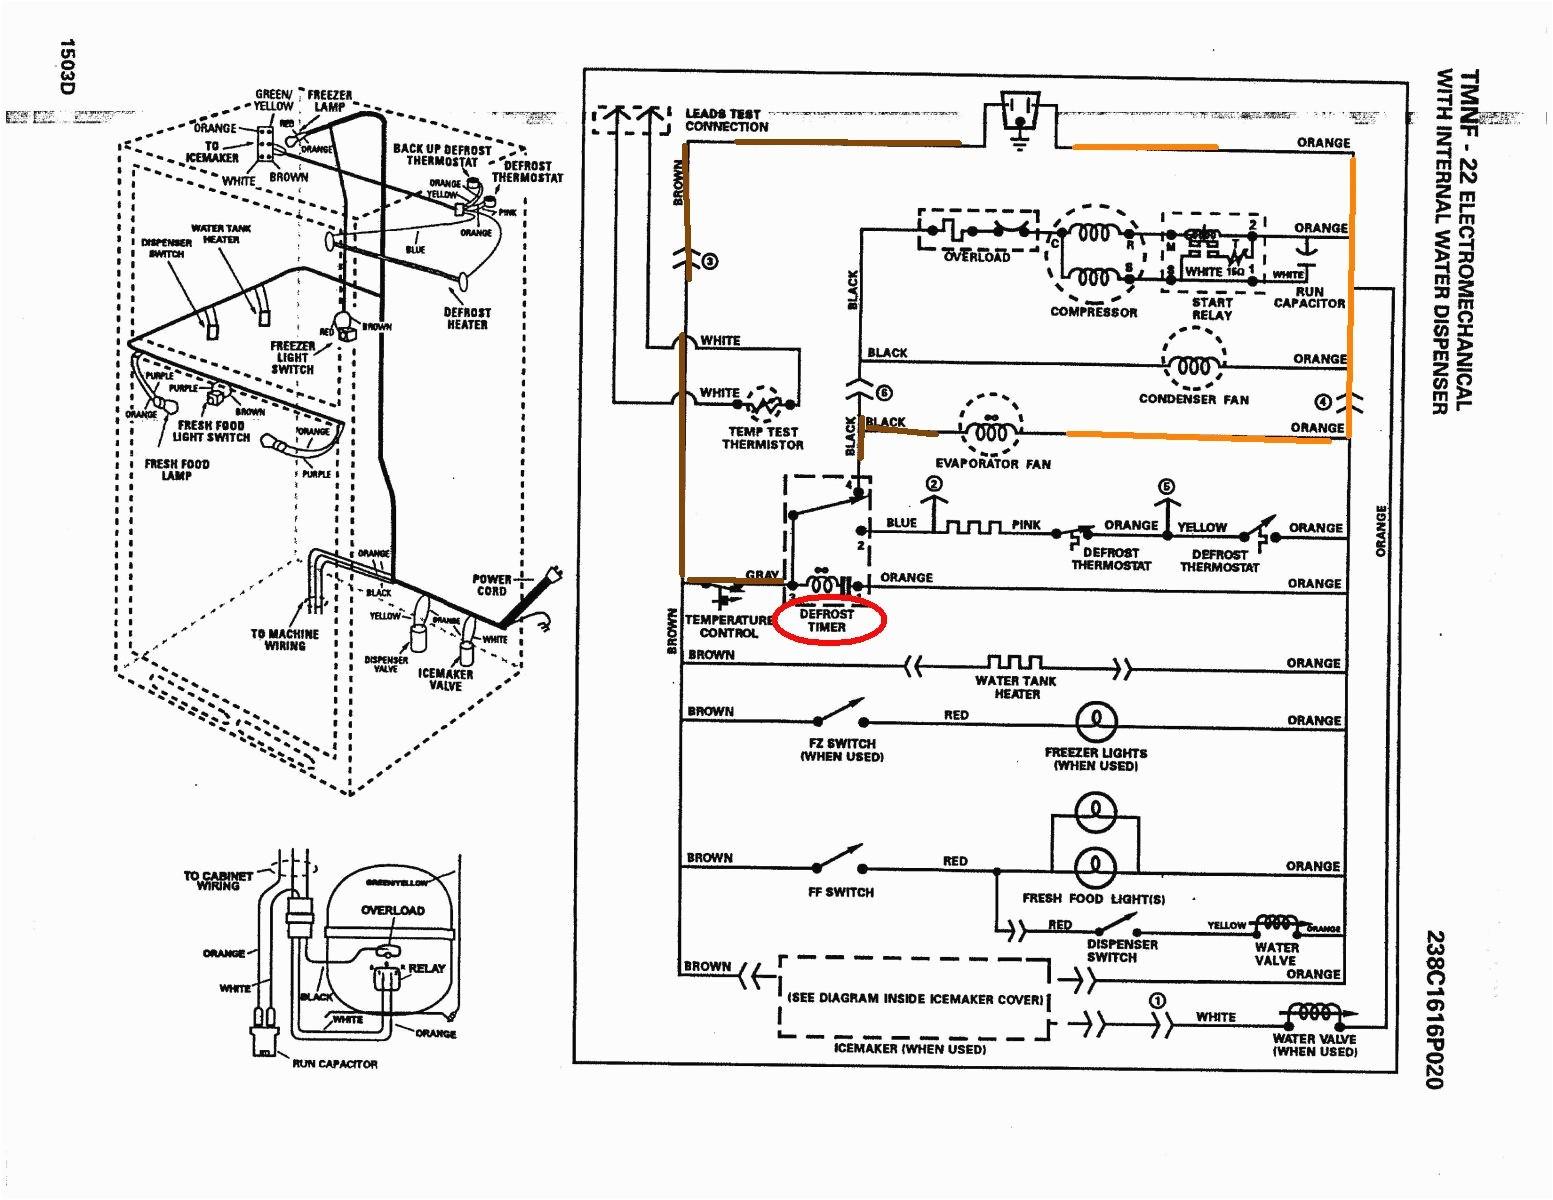 fridgemaster thermostat wiring diagram best of kenmore refrigerator ice maker schematic get free image about wiring